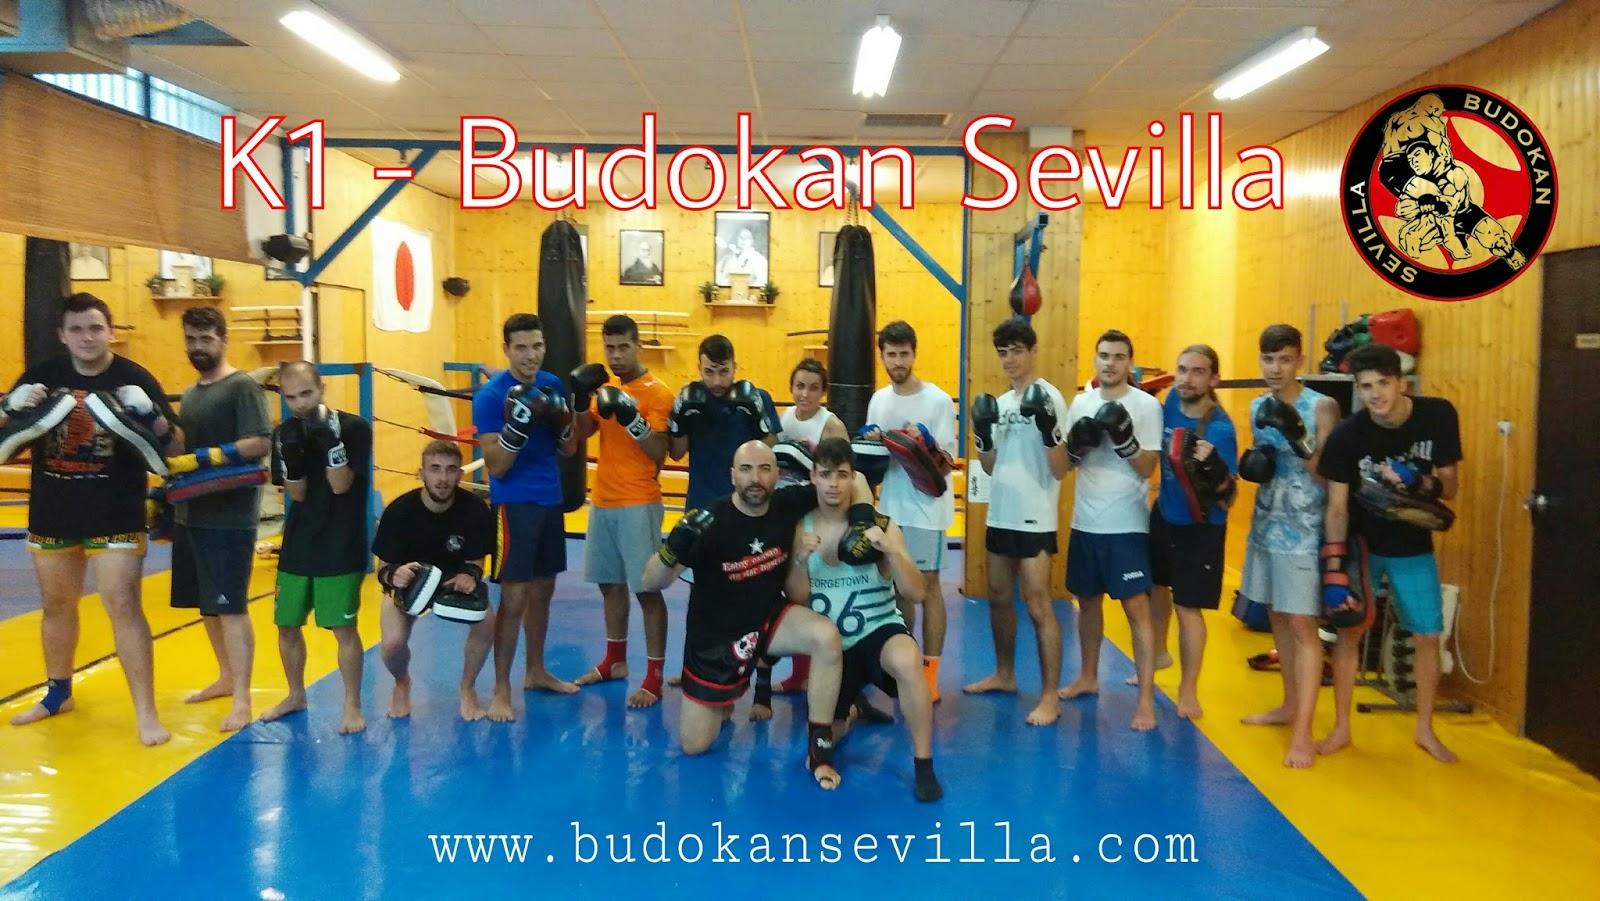 Budokan blog de artes marciales k1 budokan sevilla - Artes marciales sevilla ...